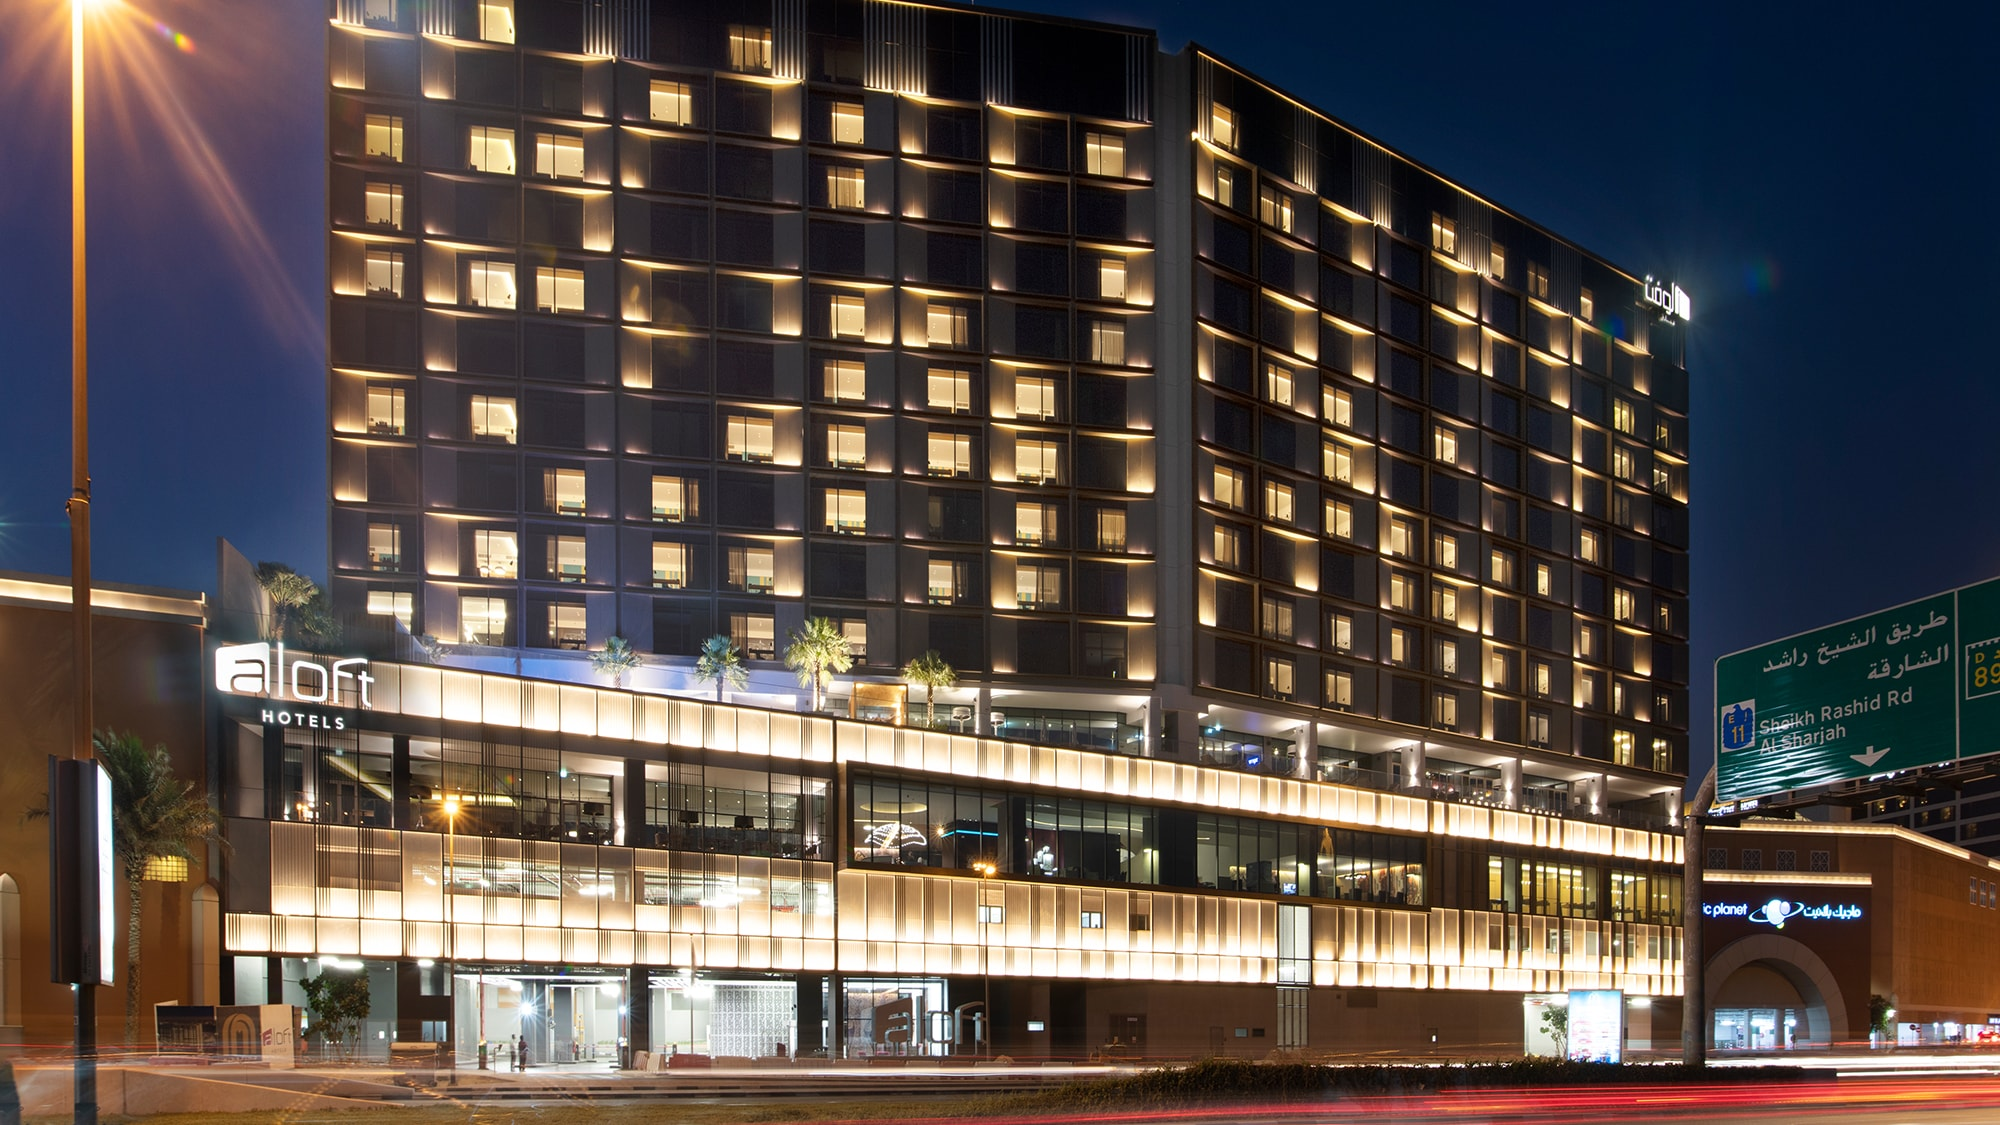 aloft-hotel-image-1-min